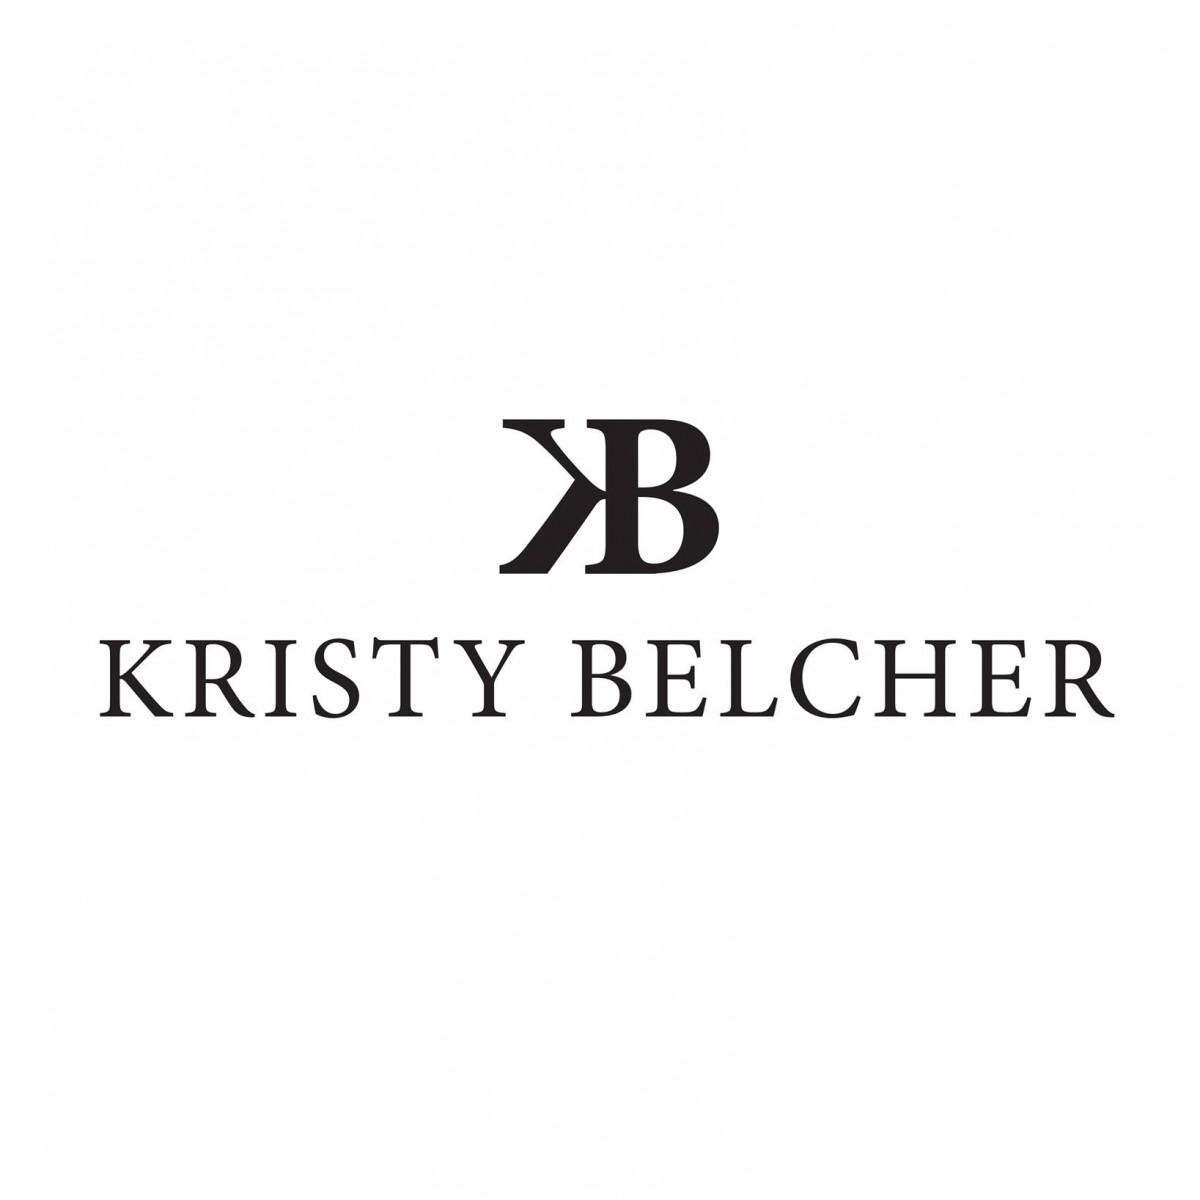 Kristy Belcher Photography